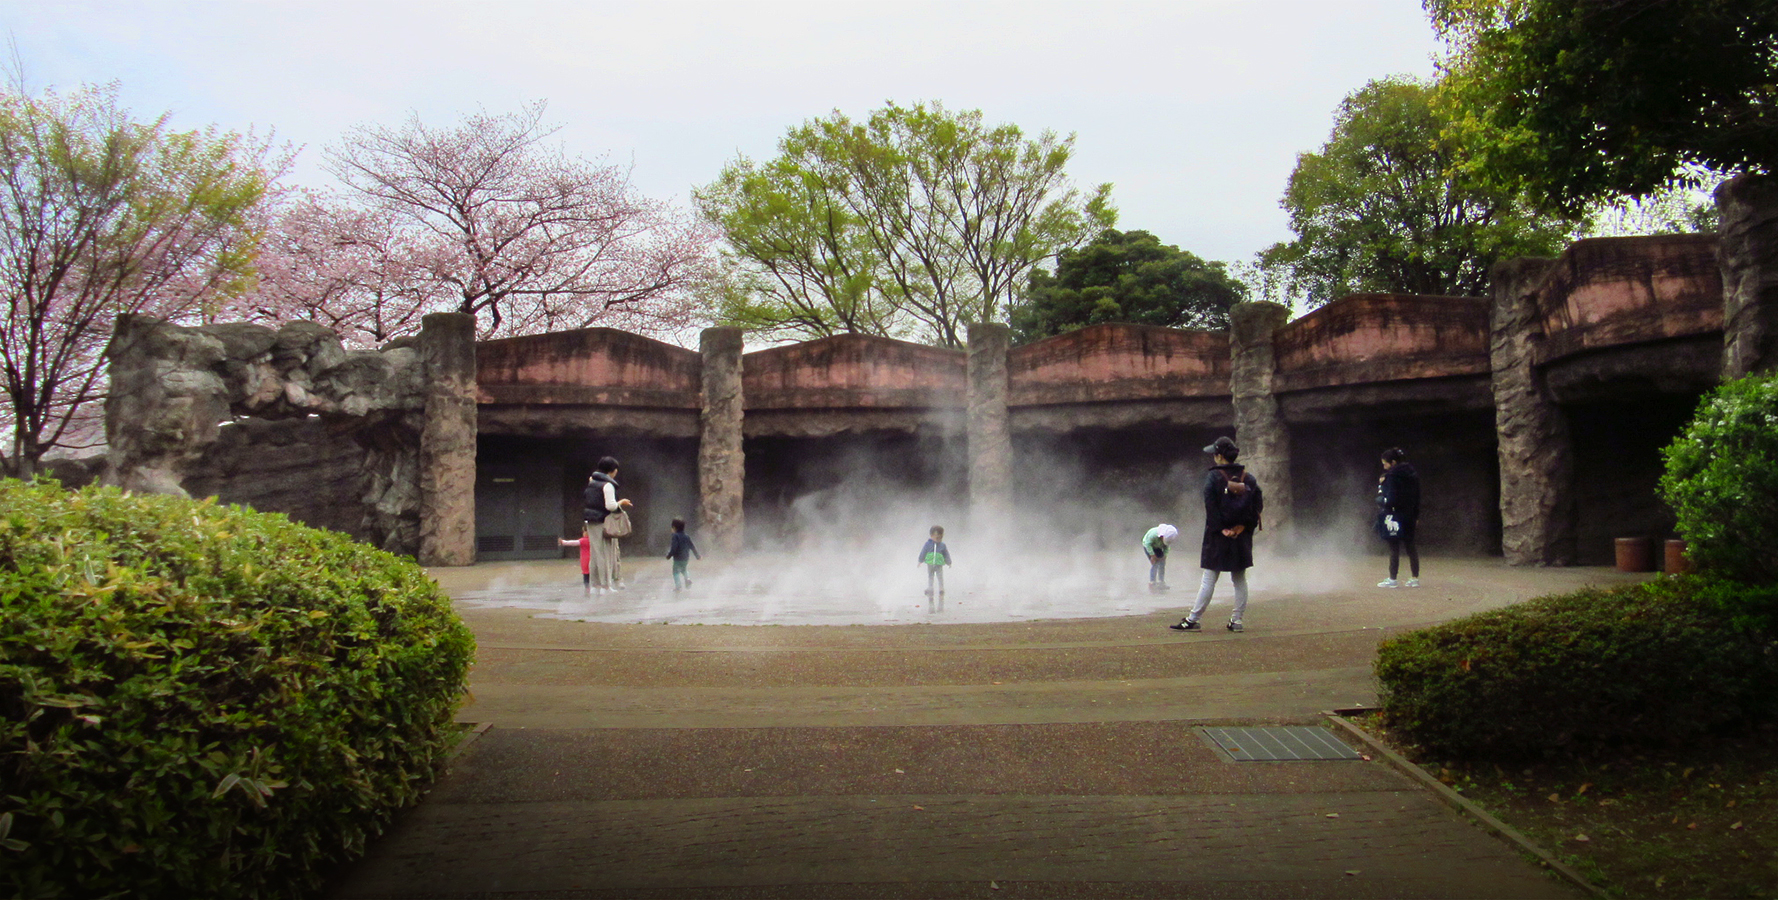 http://moritetsu.info/train/img/IMG_4243sssss-kaizuka-palk.jpg